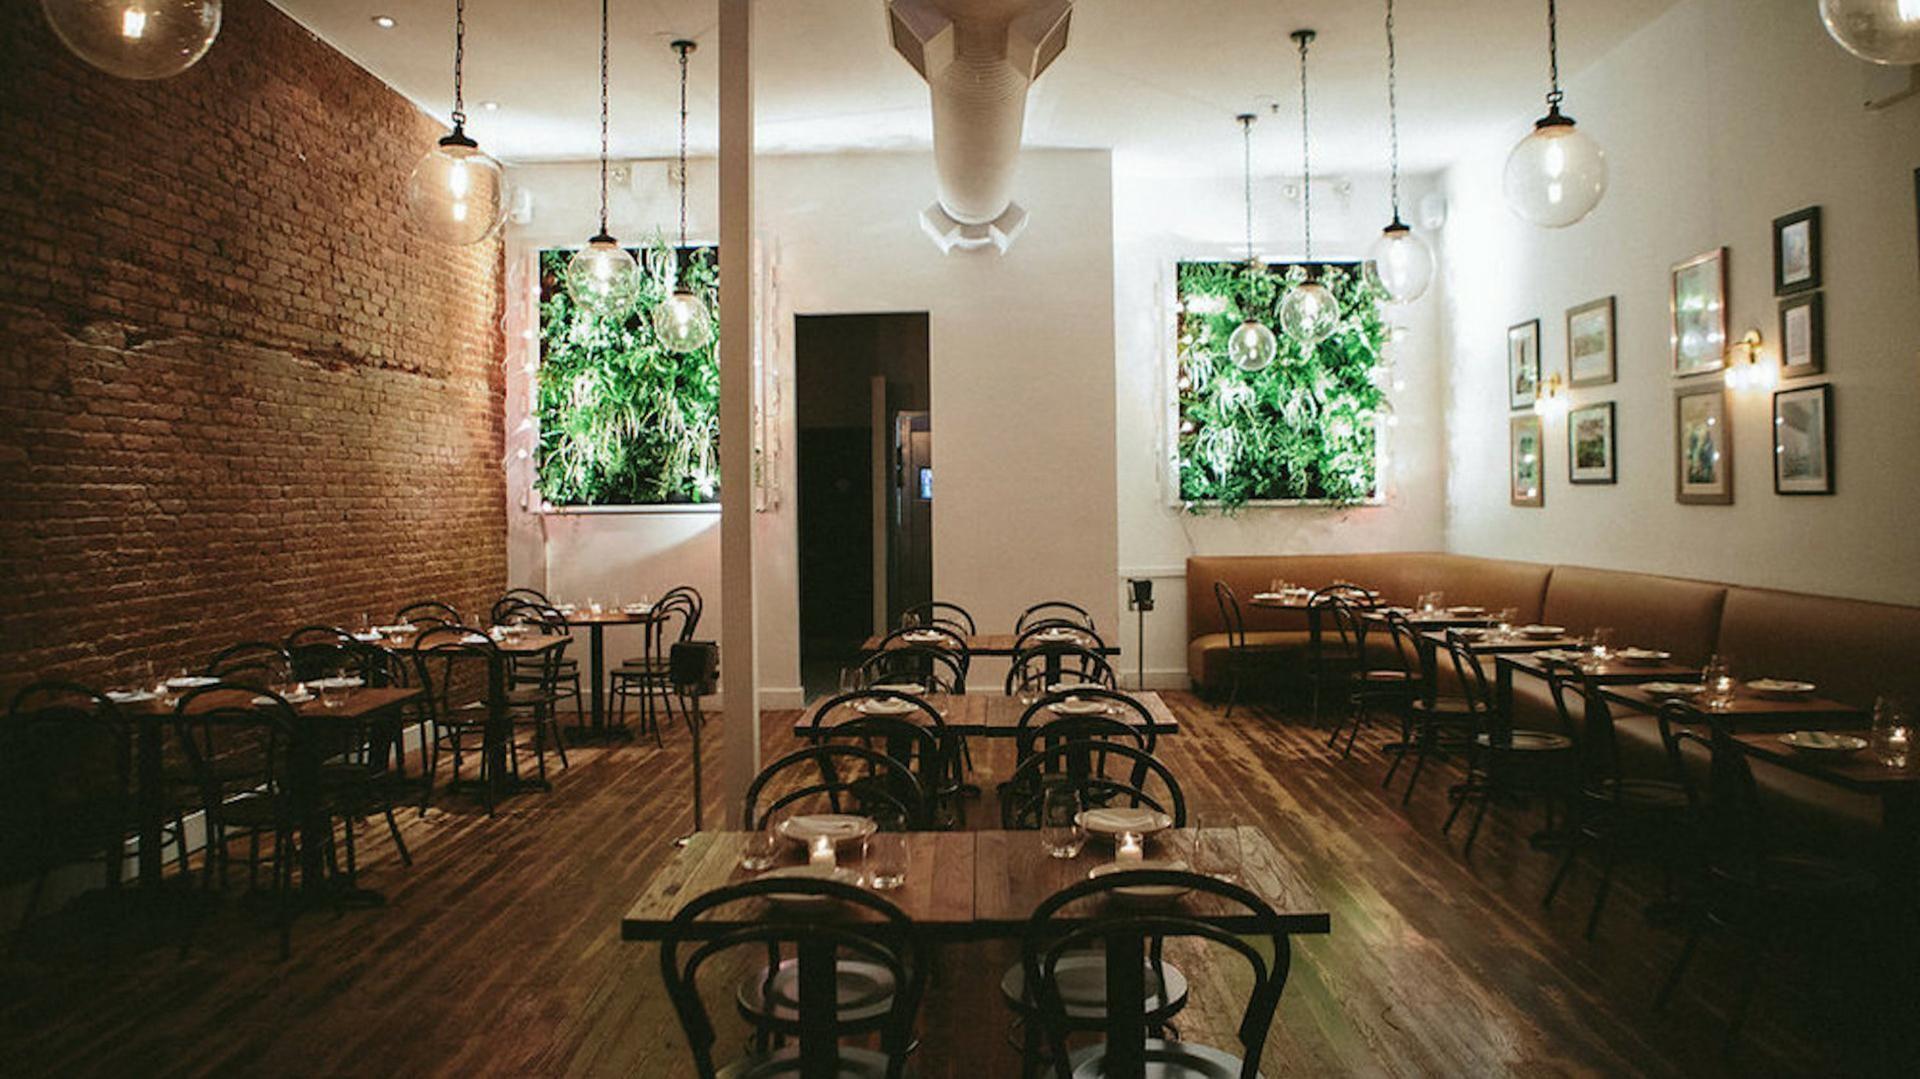 Restaurant Event Space In New York New York Gran Morsi Provides Best Stk Private Dining Room Design Ideas